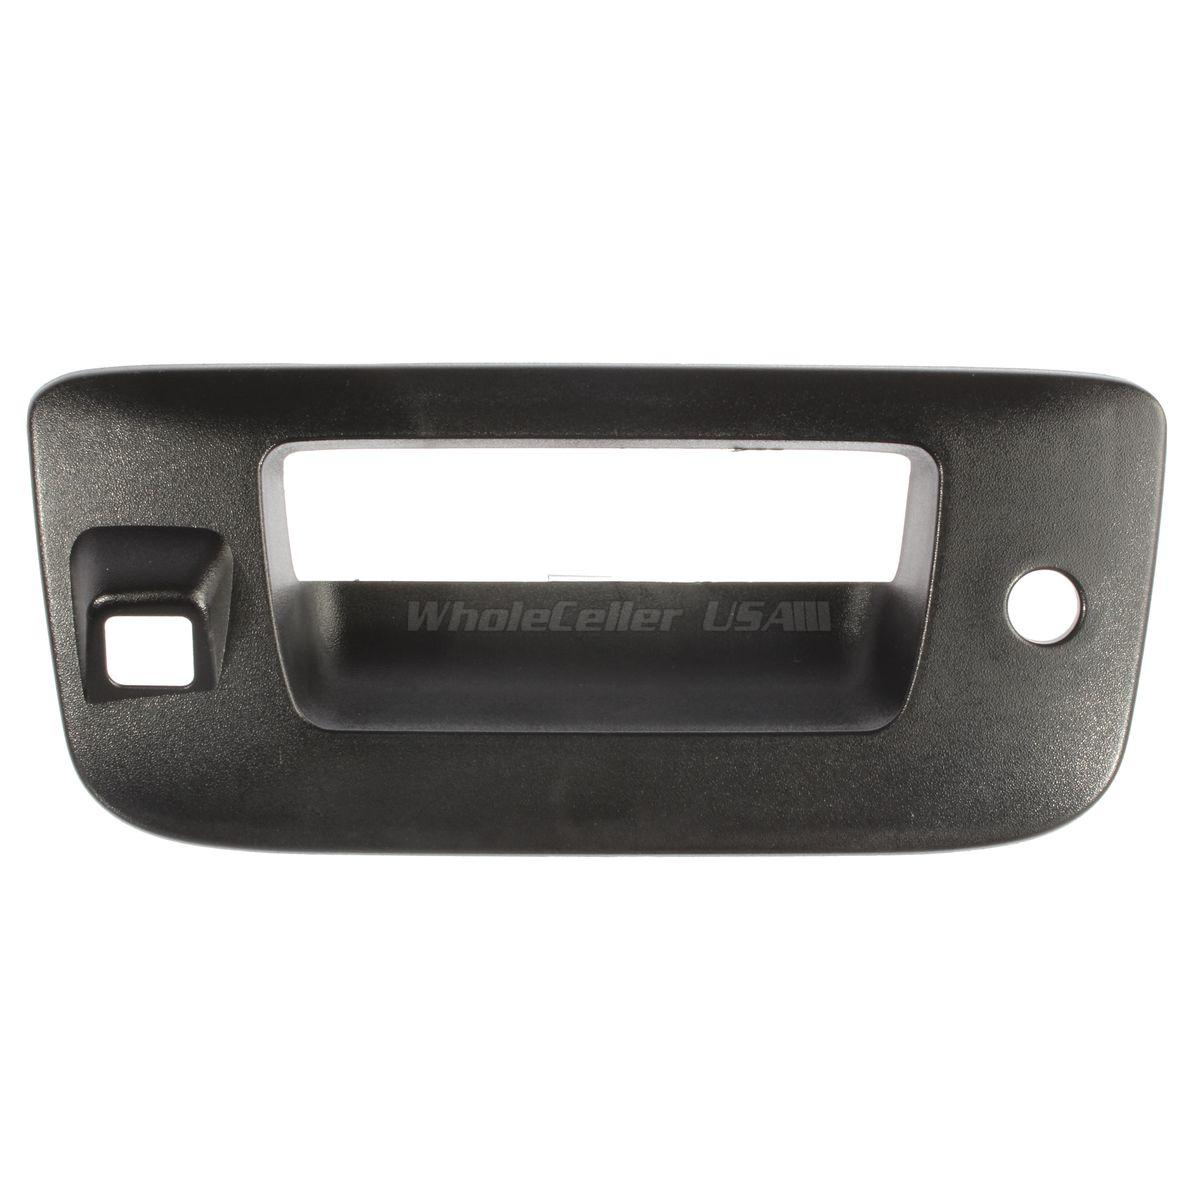 Black Tailgate Handle Bezel with Key Camera Hole for 07-14 GMC Silverado Sierra